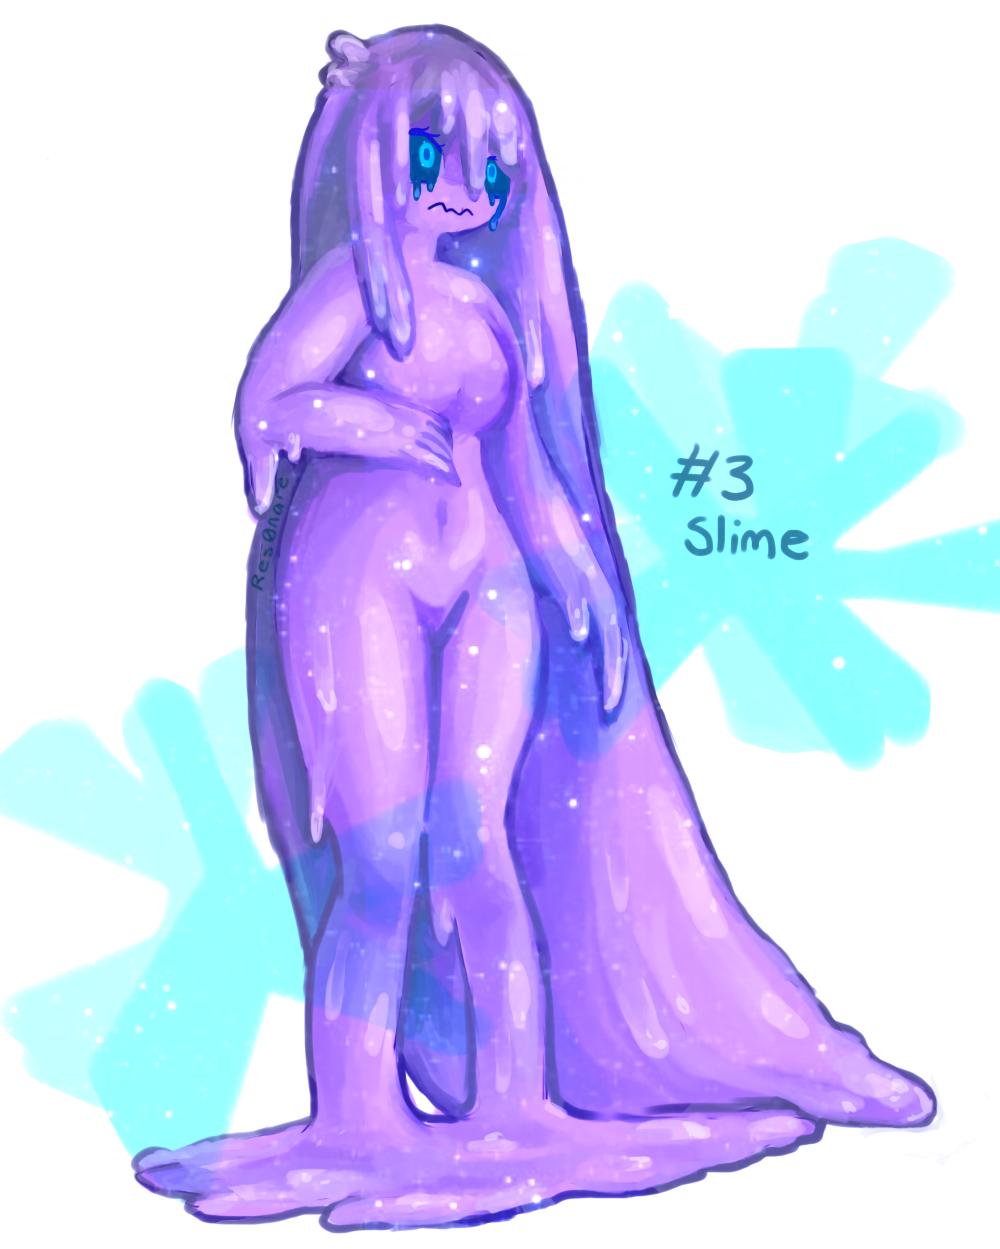 Monster girl slime nude image